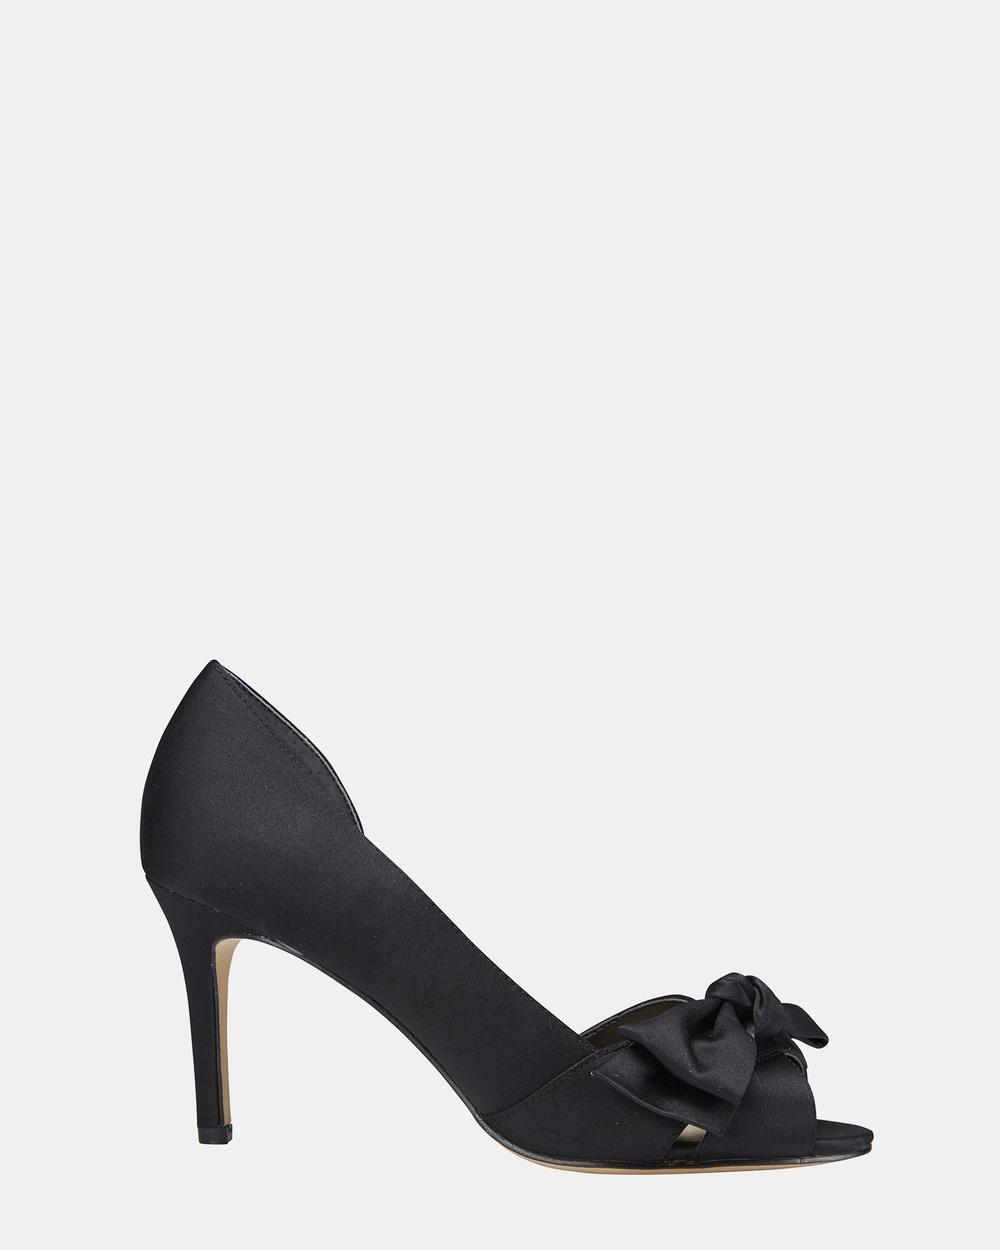 NINA FORBES 2 Heels BLACK FORBES 2